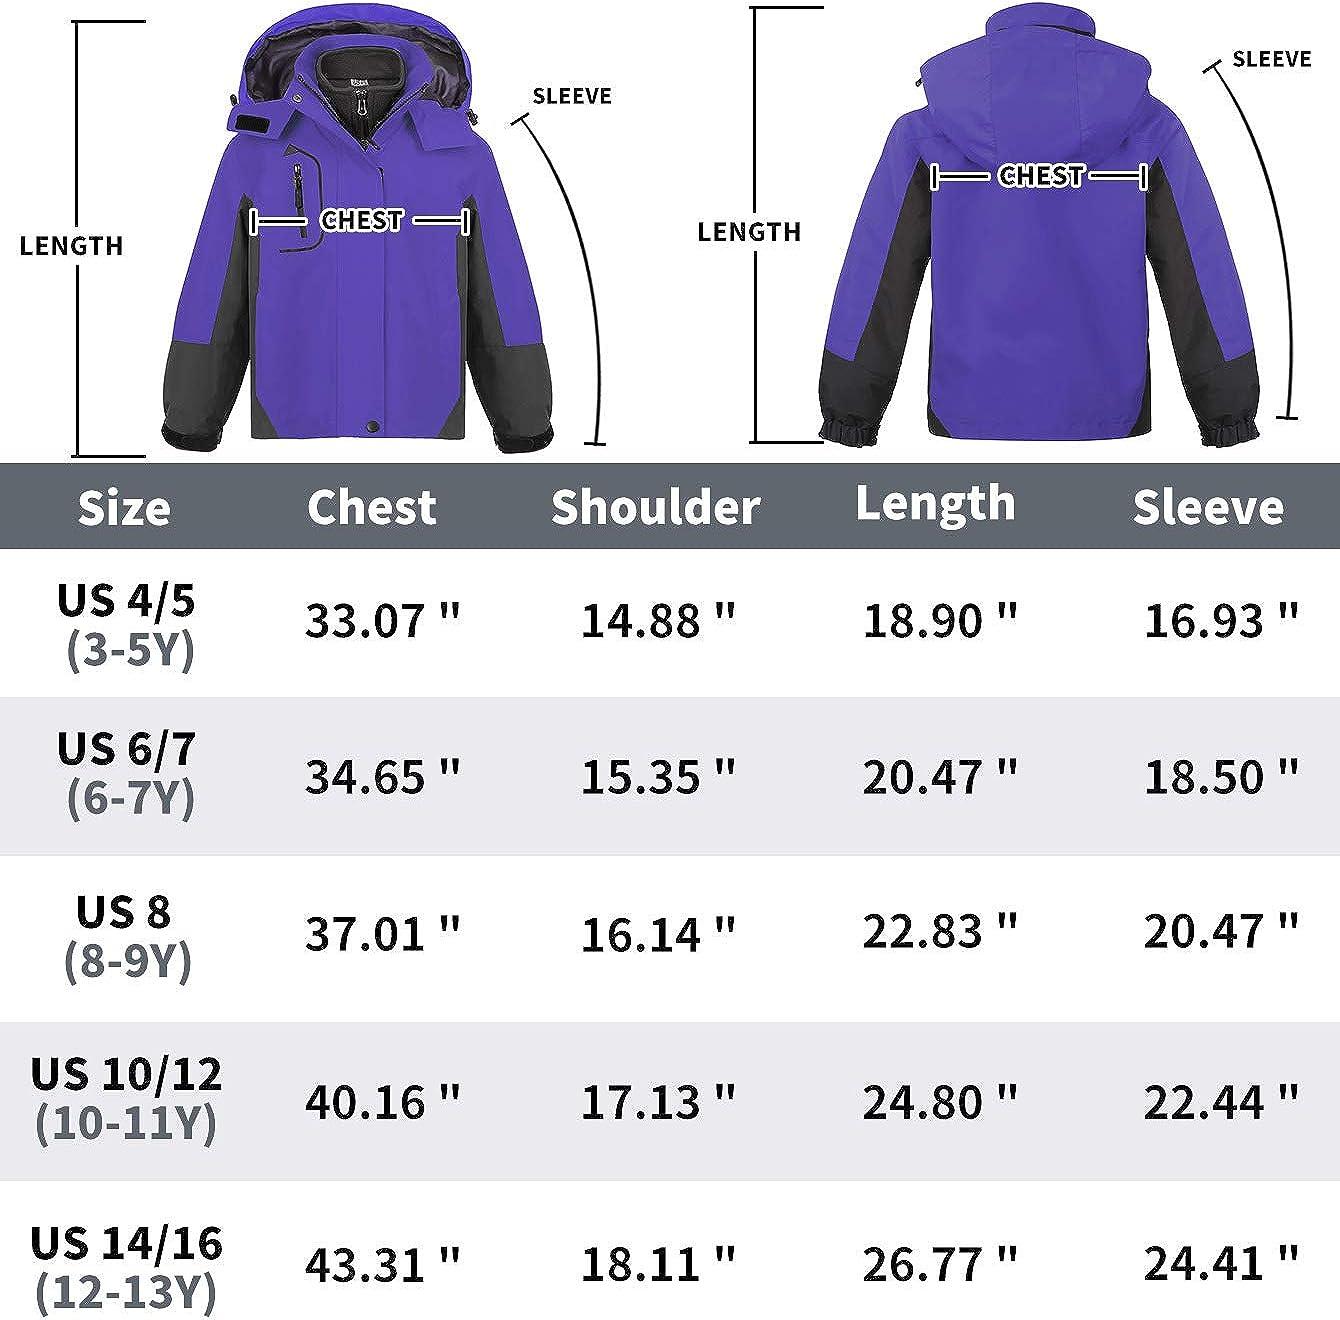 MORCOE Girls/' 3 in 1 Ski Jacket Outdoor Waterproof Interchange Windproof Fleece Travel Outerwear Winter Snowboard Coat